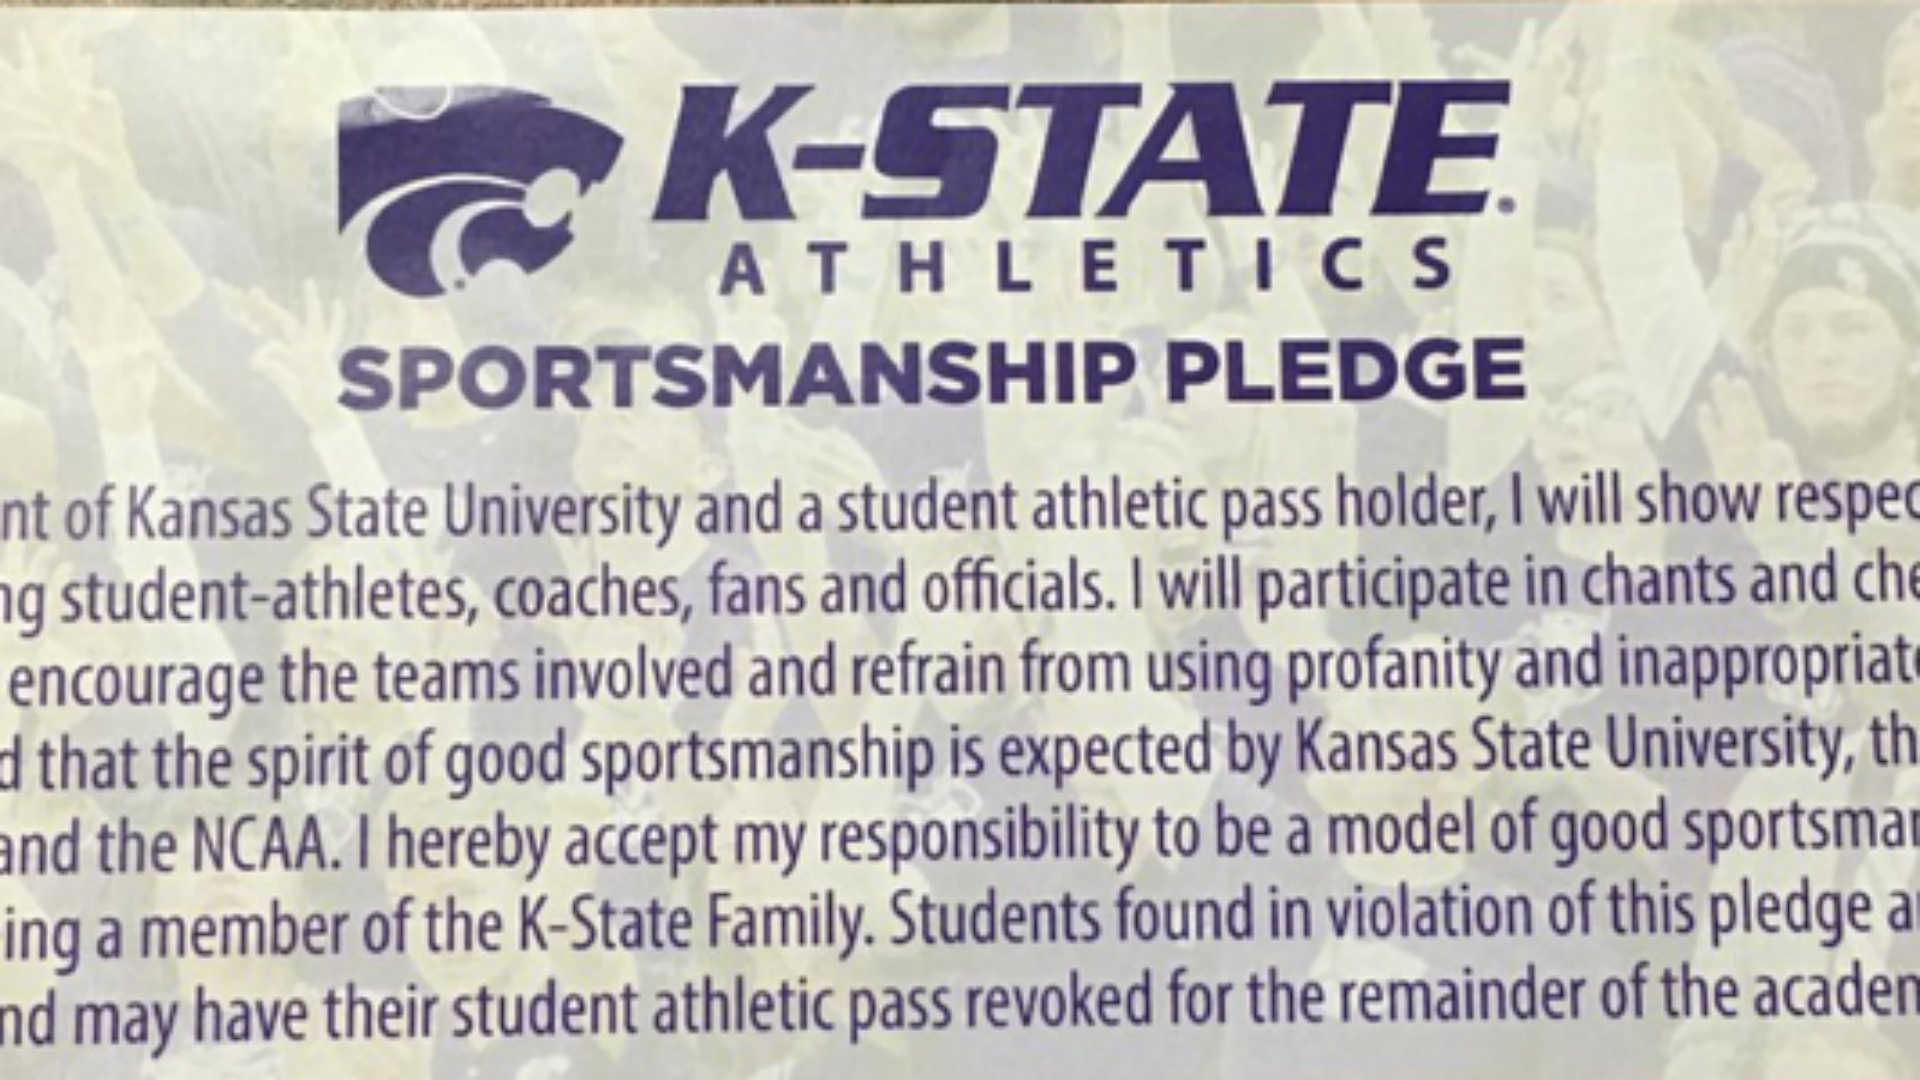 K-State sportsmanship pledge-021817-TW-FTR